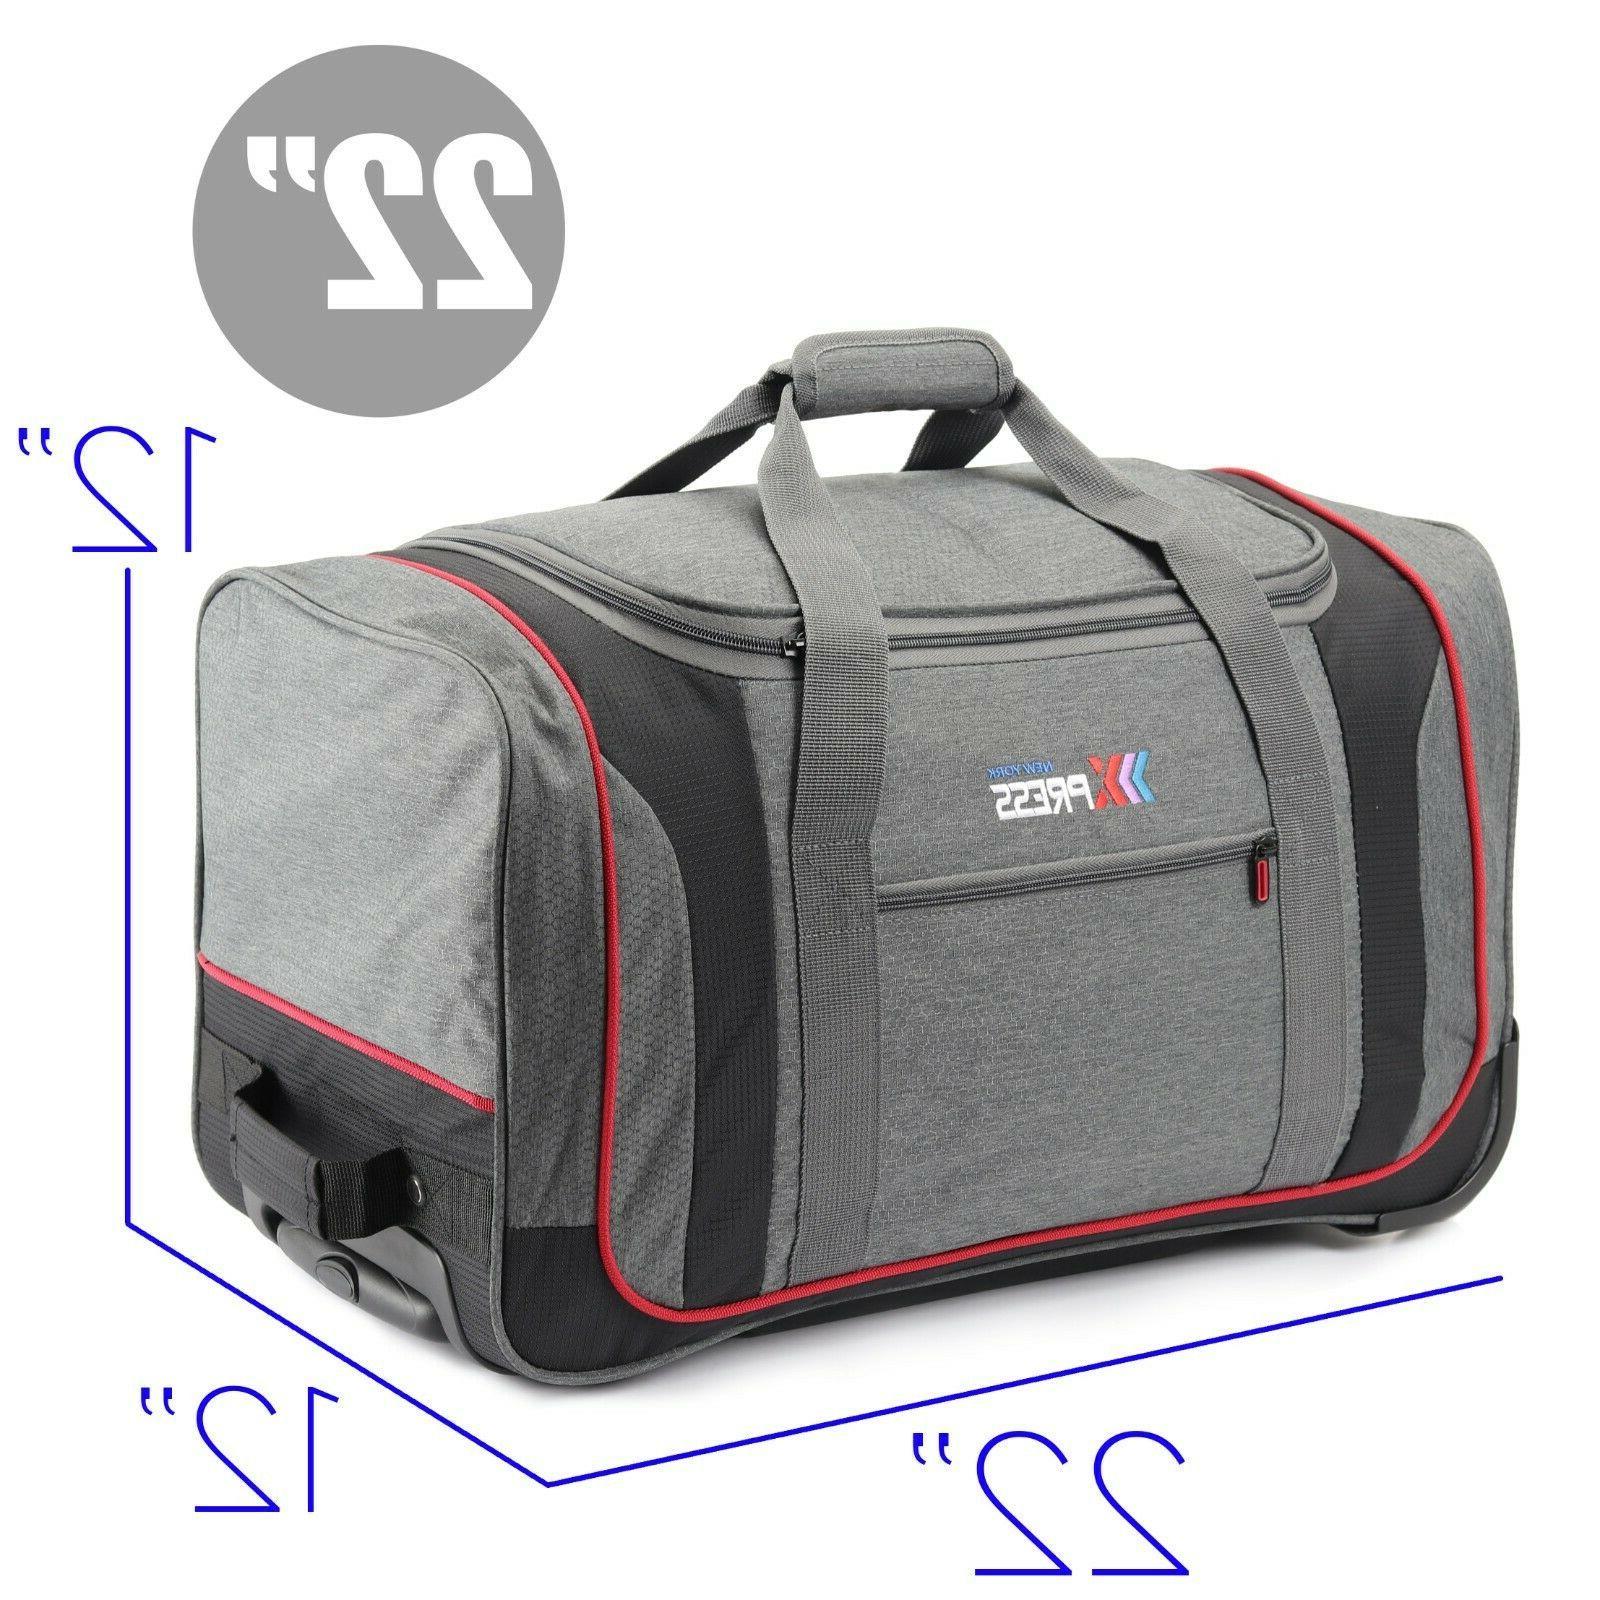 22 Rolling Wheeled Duffel Travel Luggage